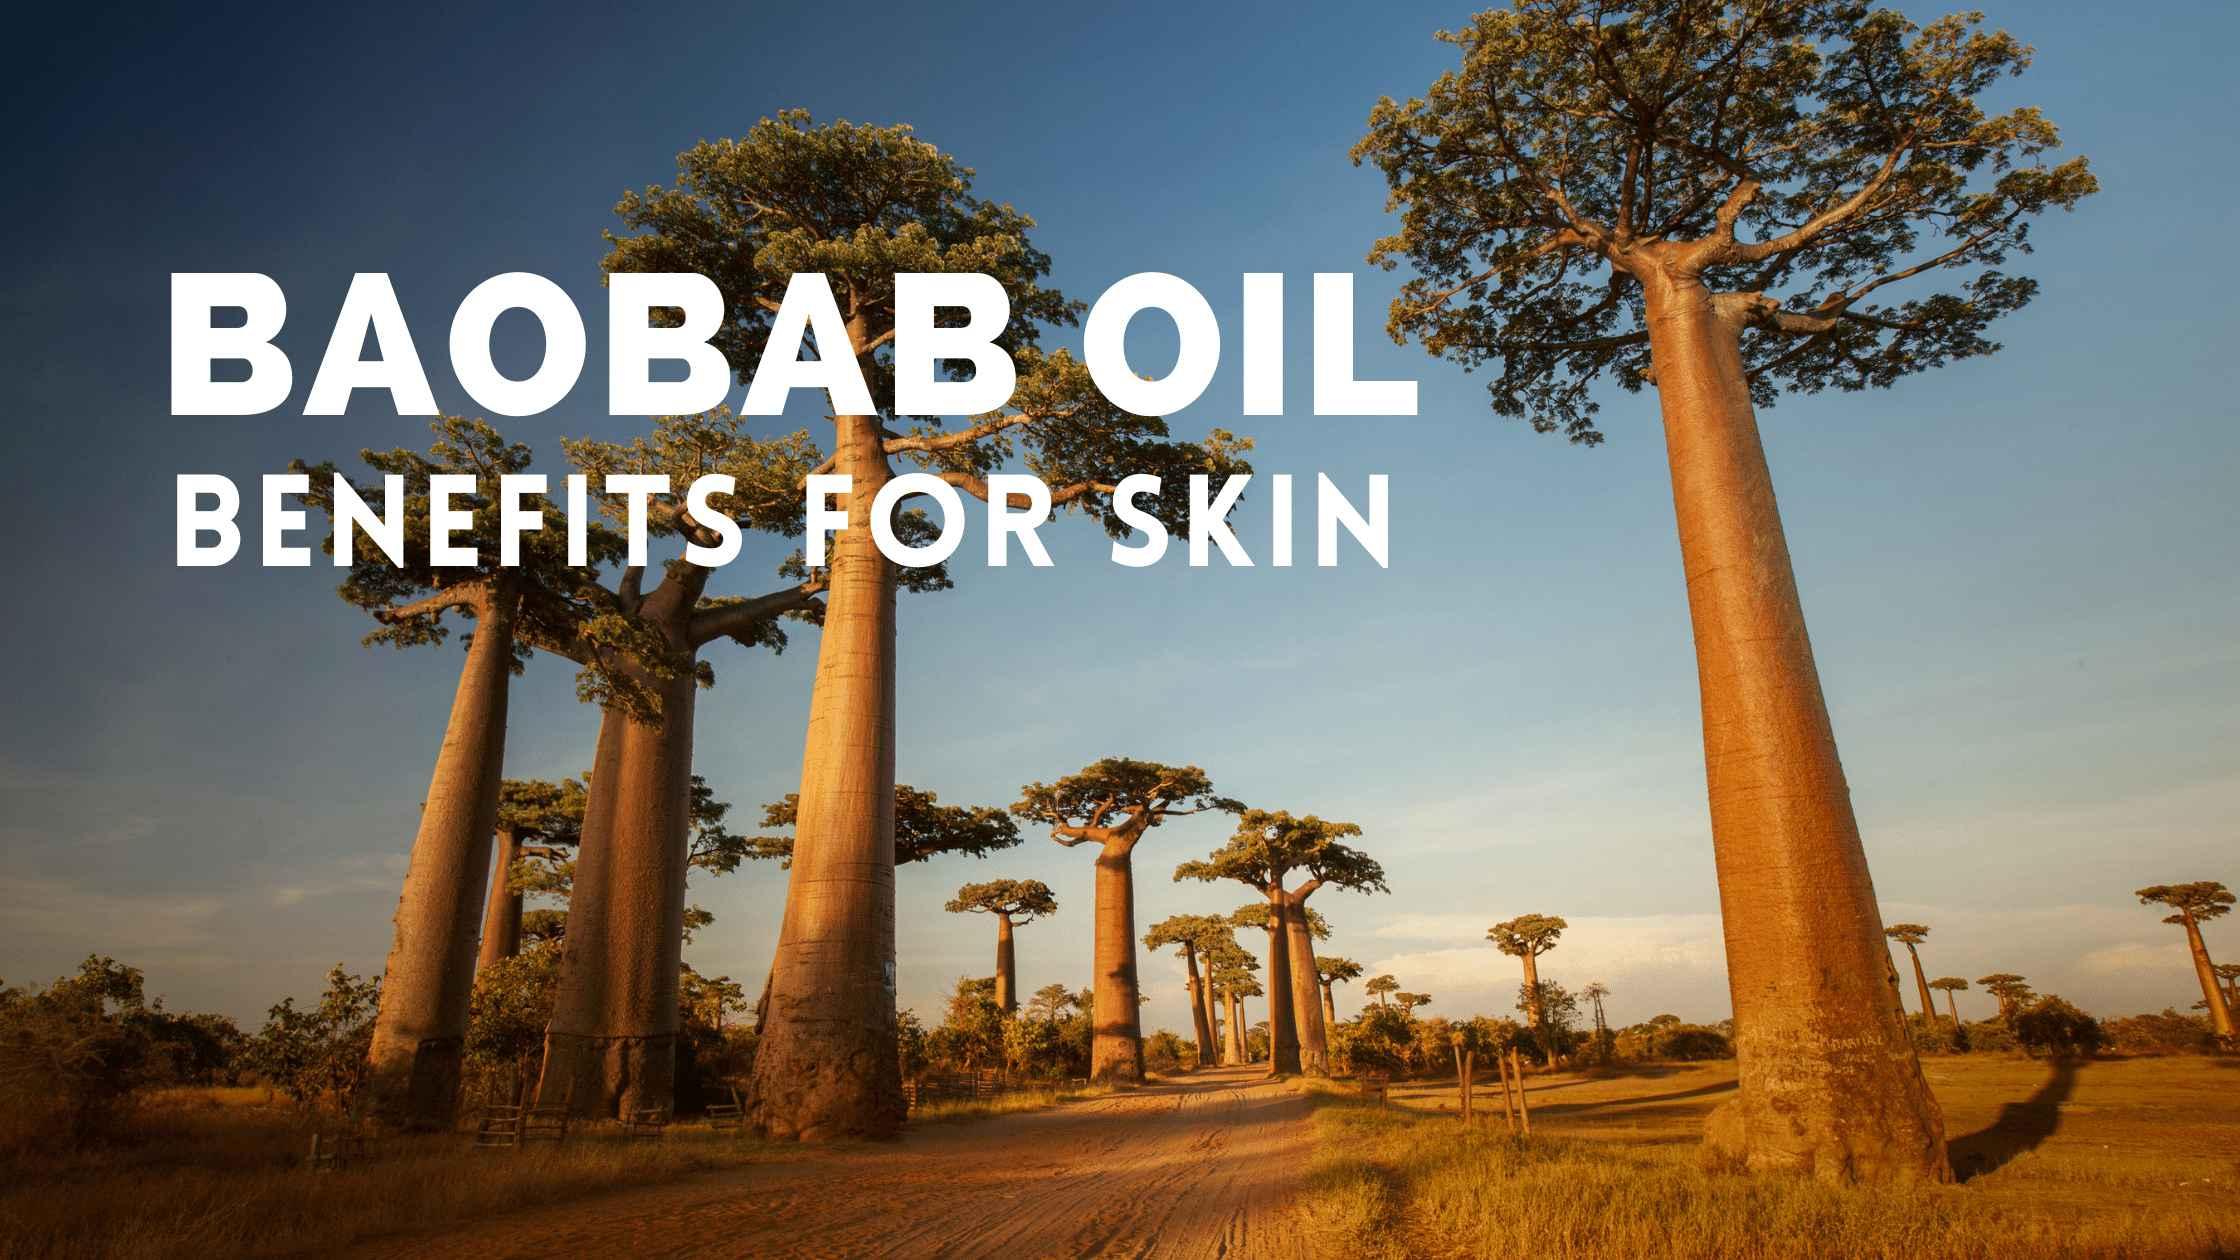 Baobab Oil Benefits for Skin